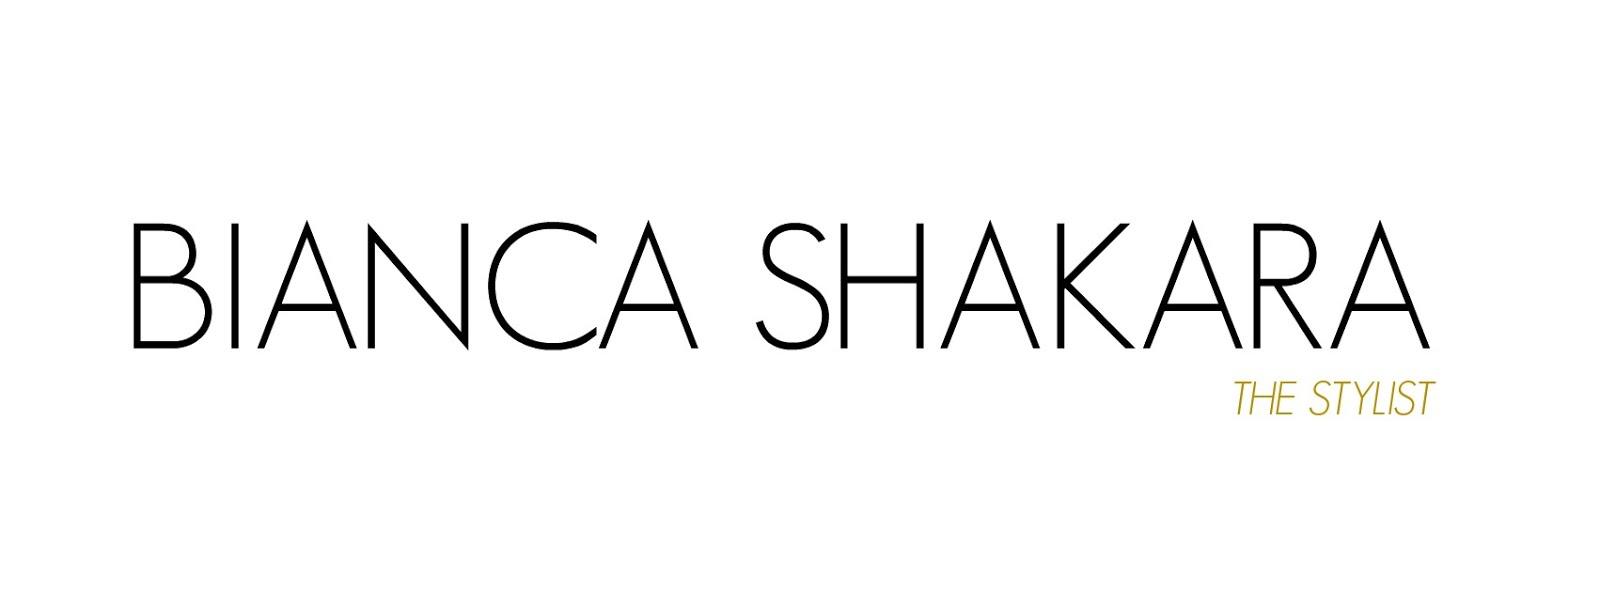 Bianca Shakara